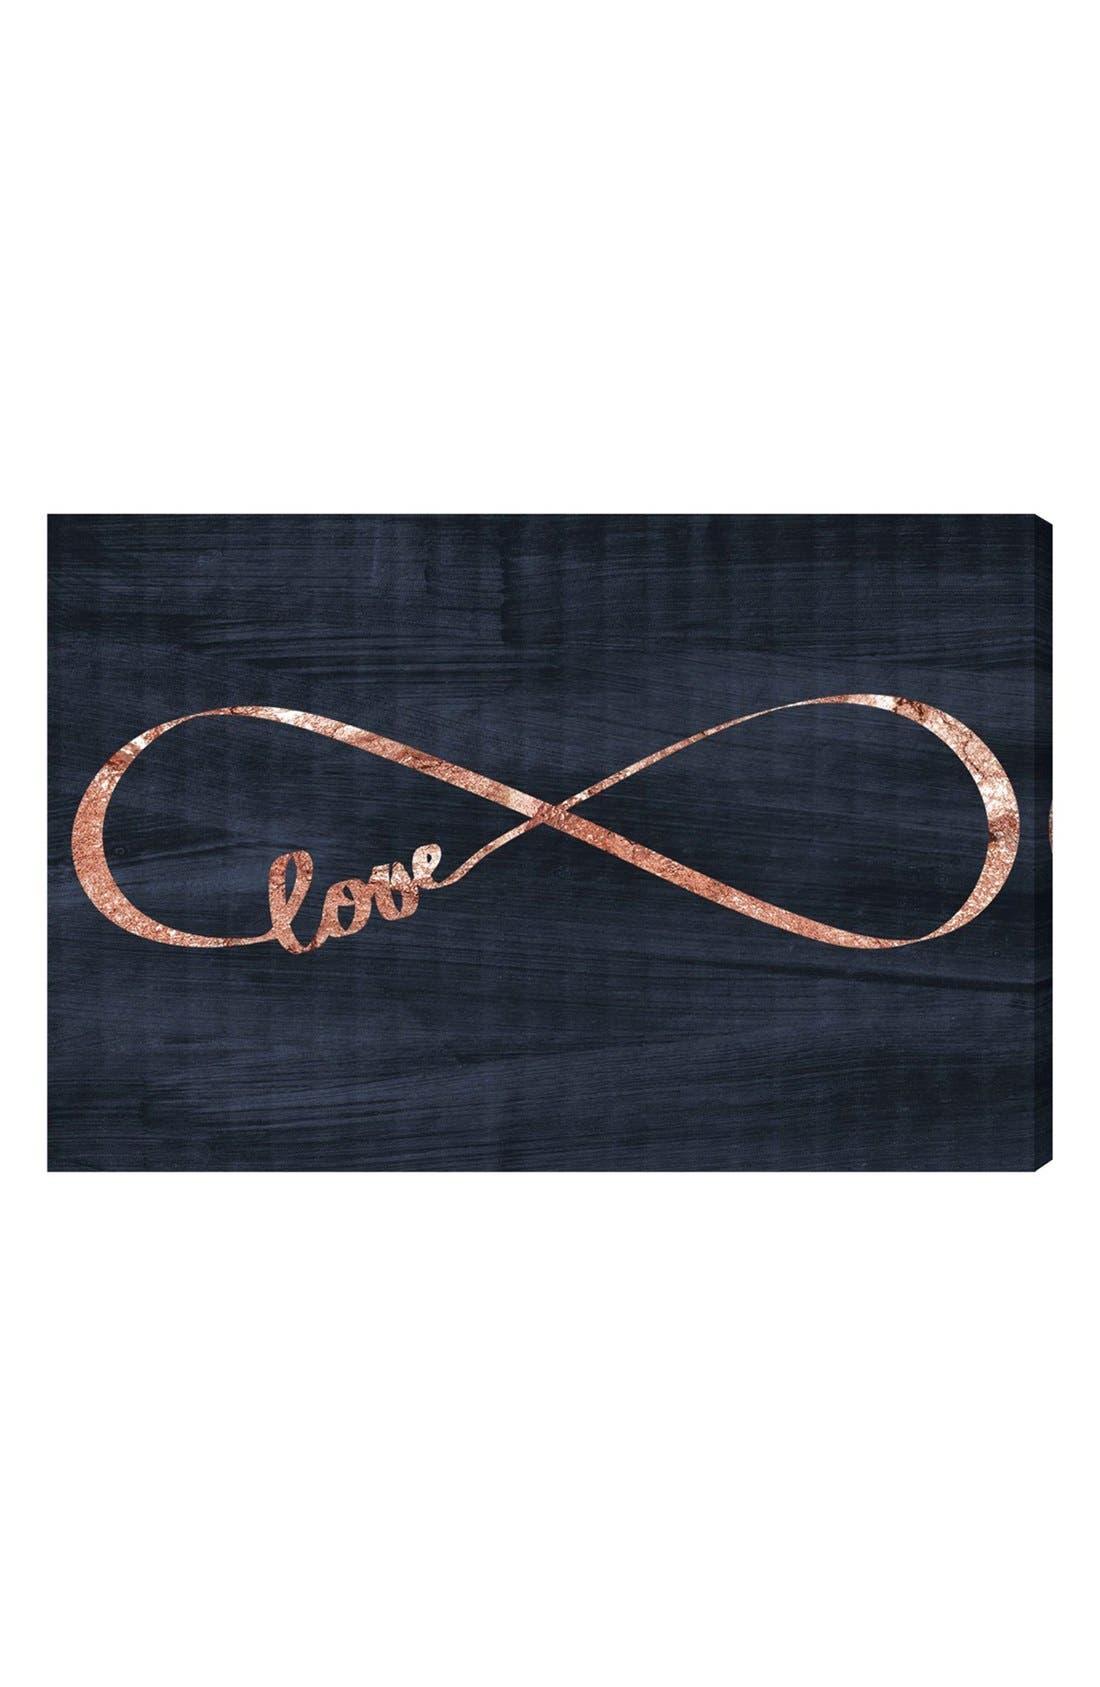 'Infinite Love' Canvas Wall Art,                         Main,                         color, 001